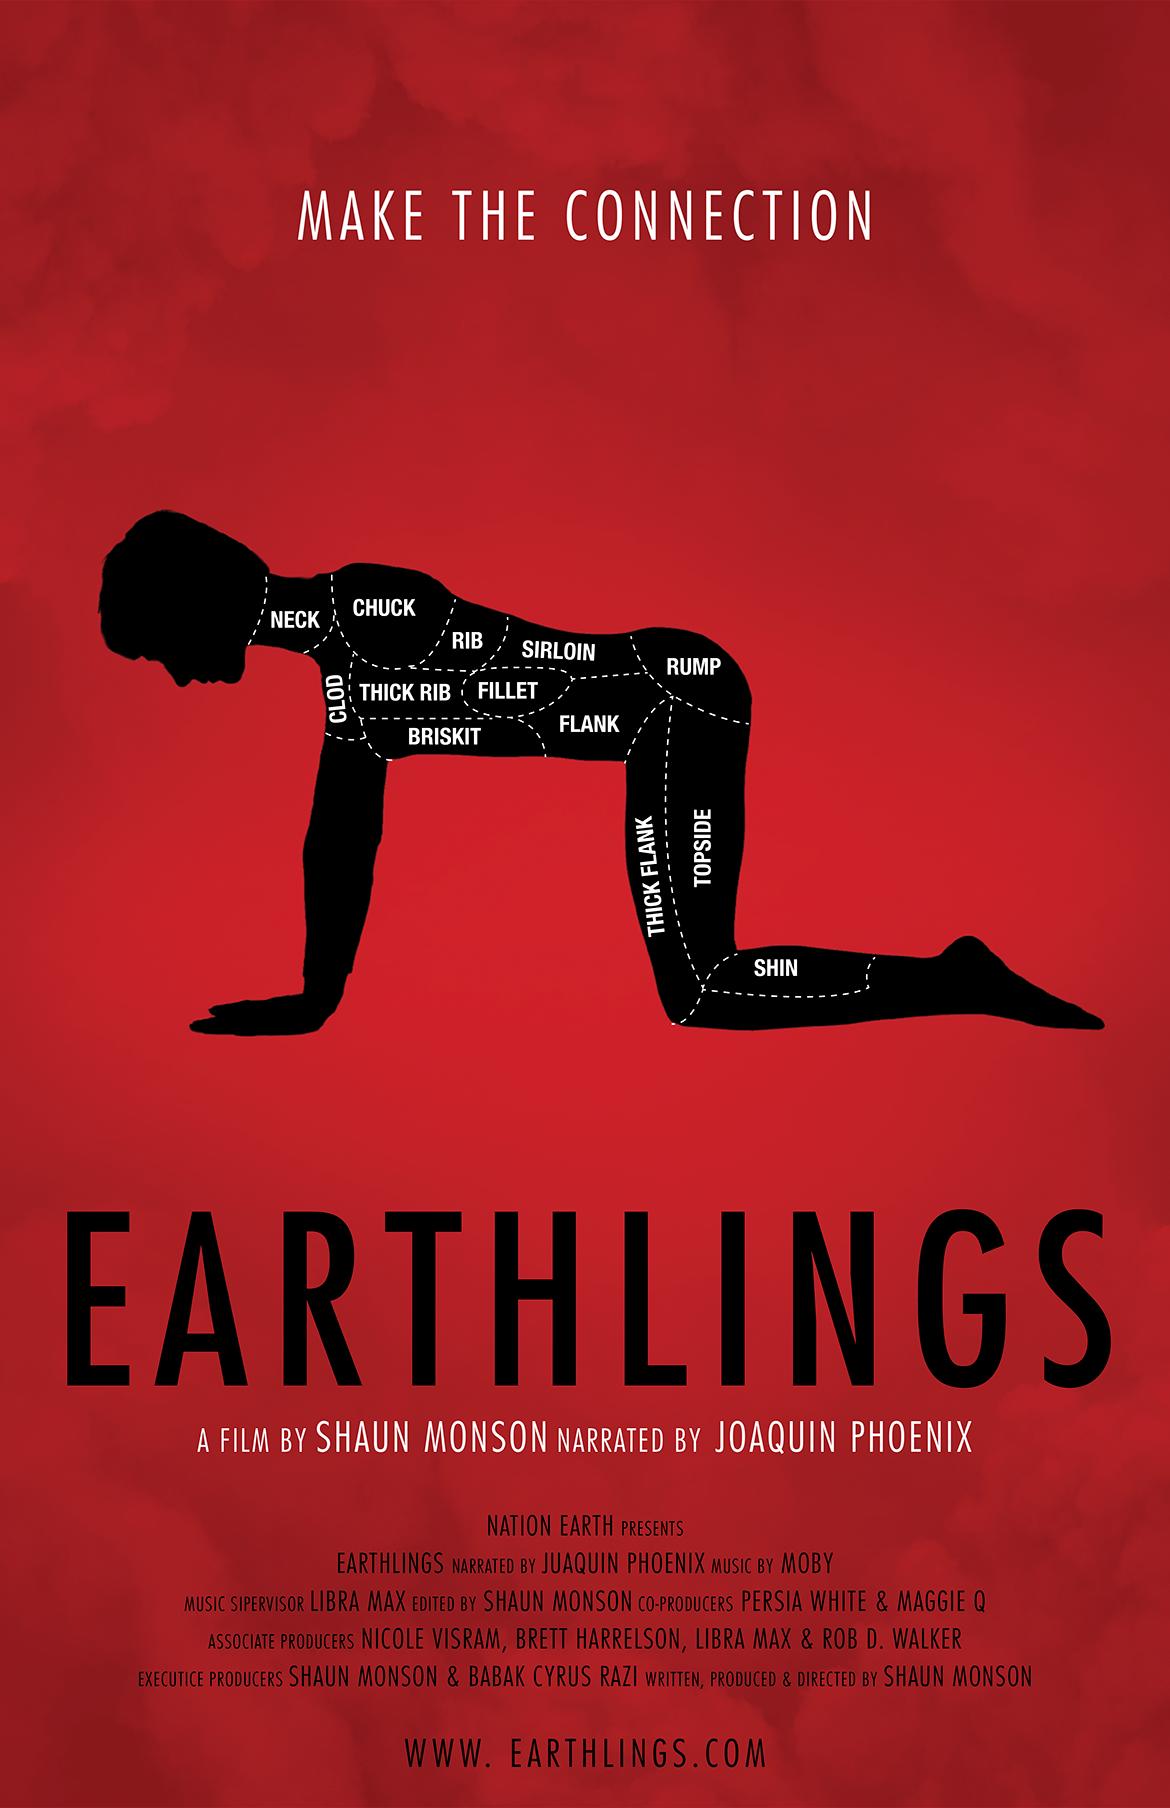 Earthlings Daron Hovanessian